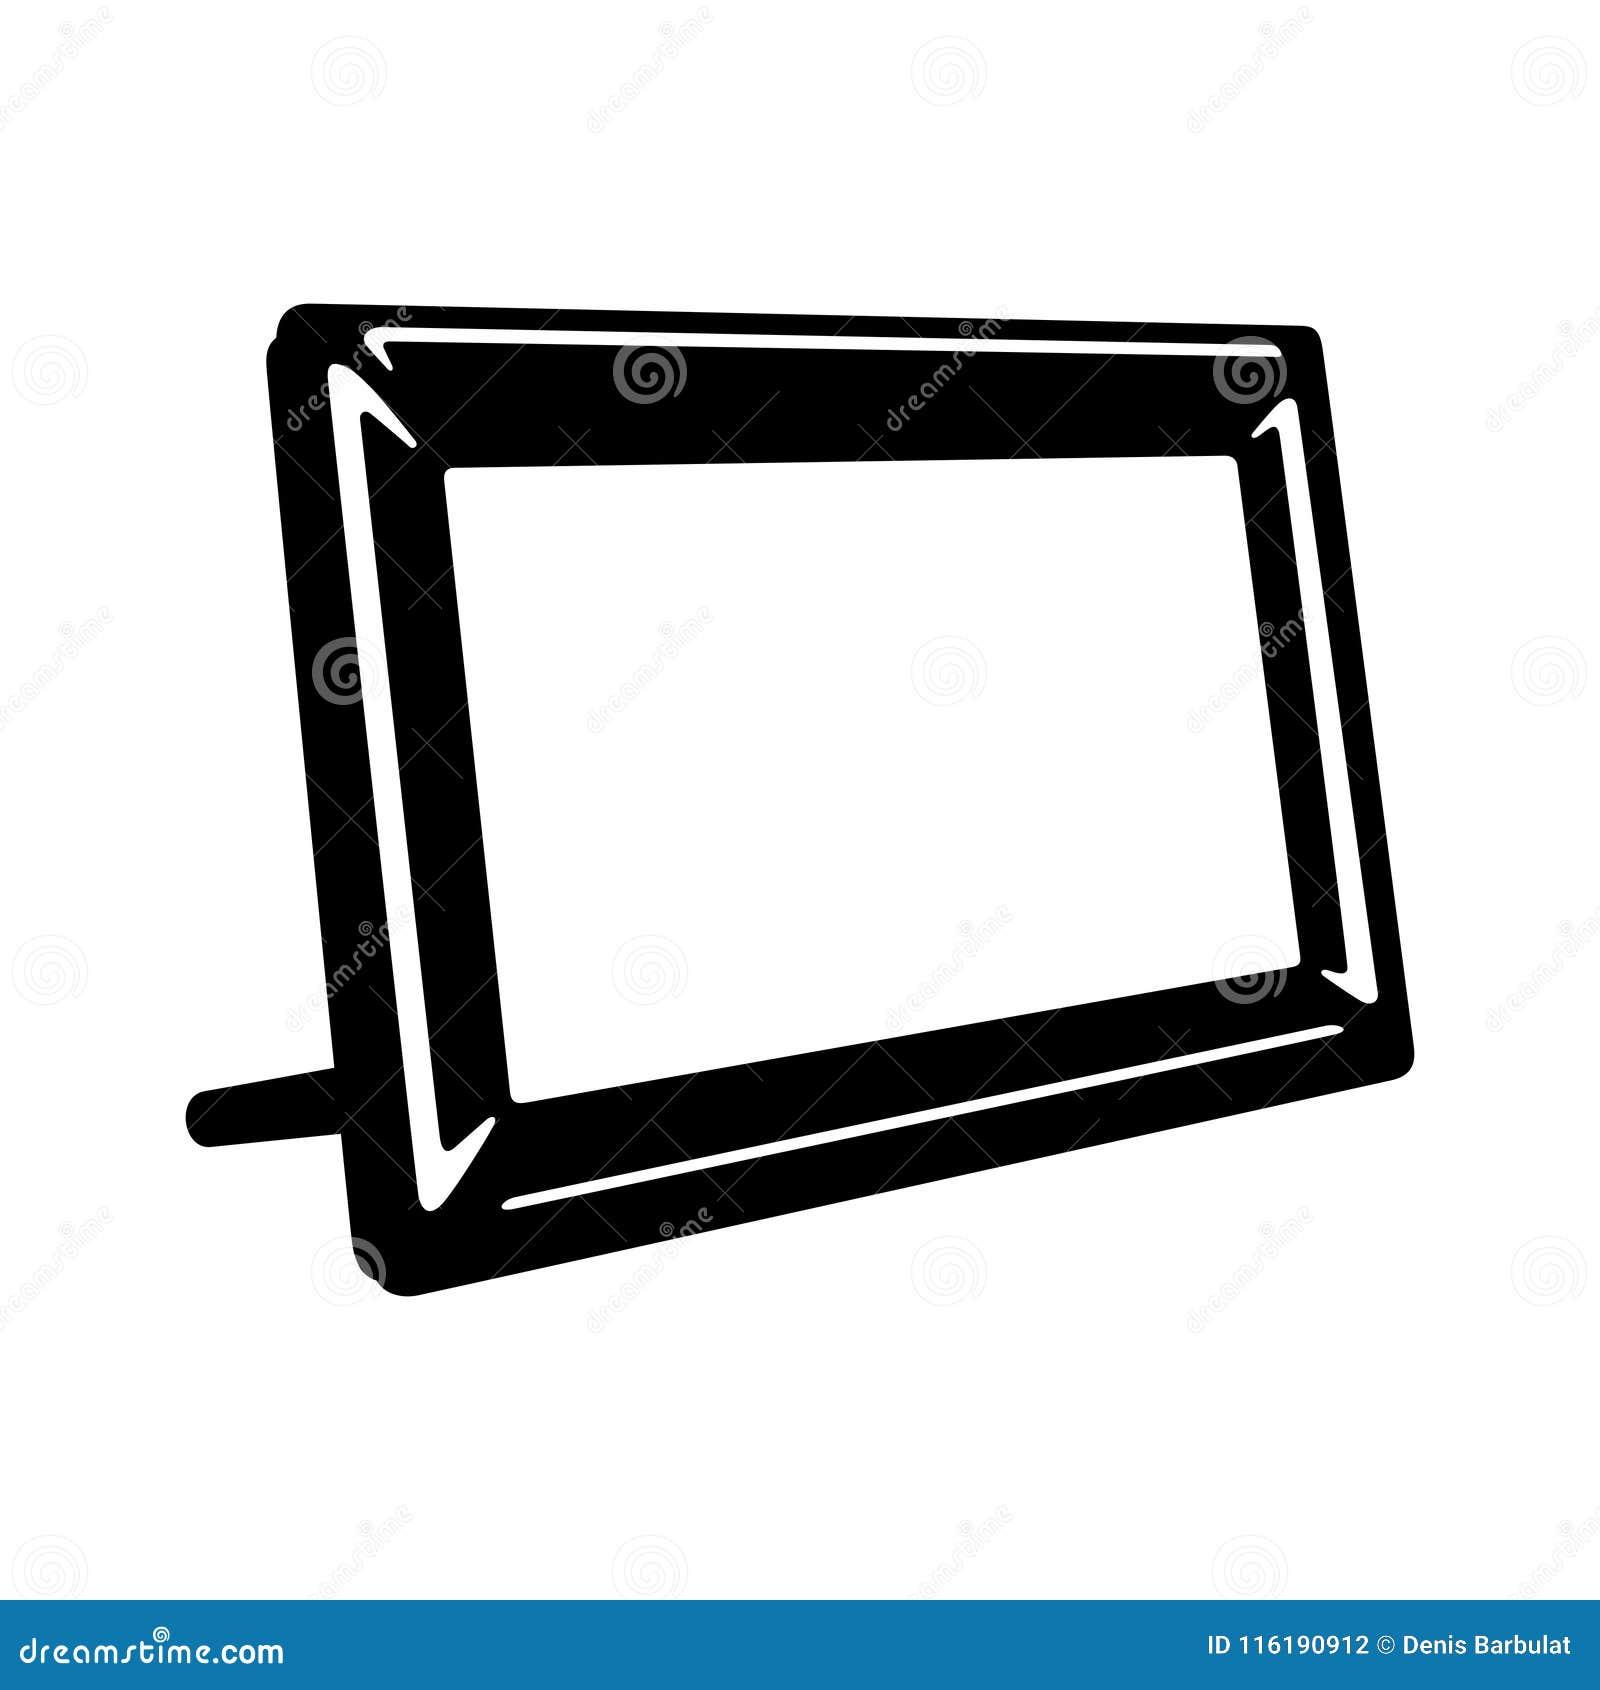 Digital photo frame stock vector. Illustration of monitor - 116190912